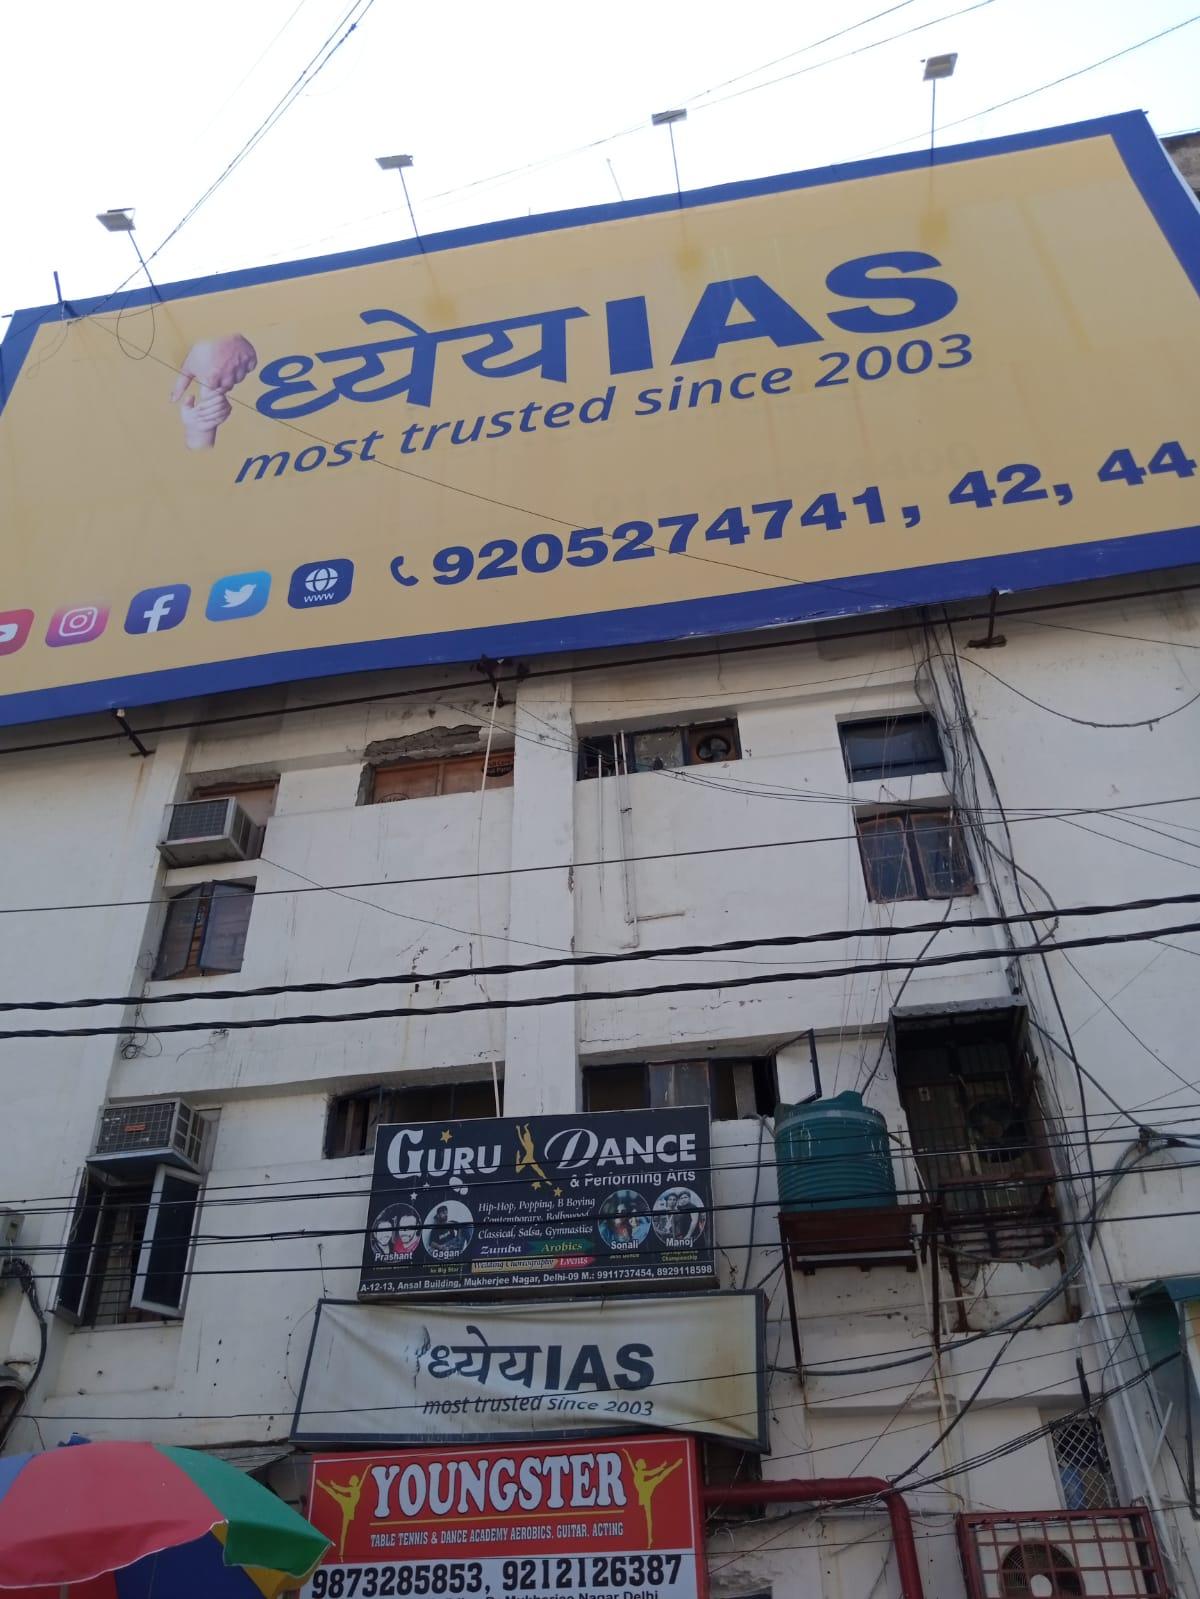 Dhyeya IAS Logo